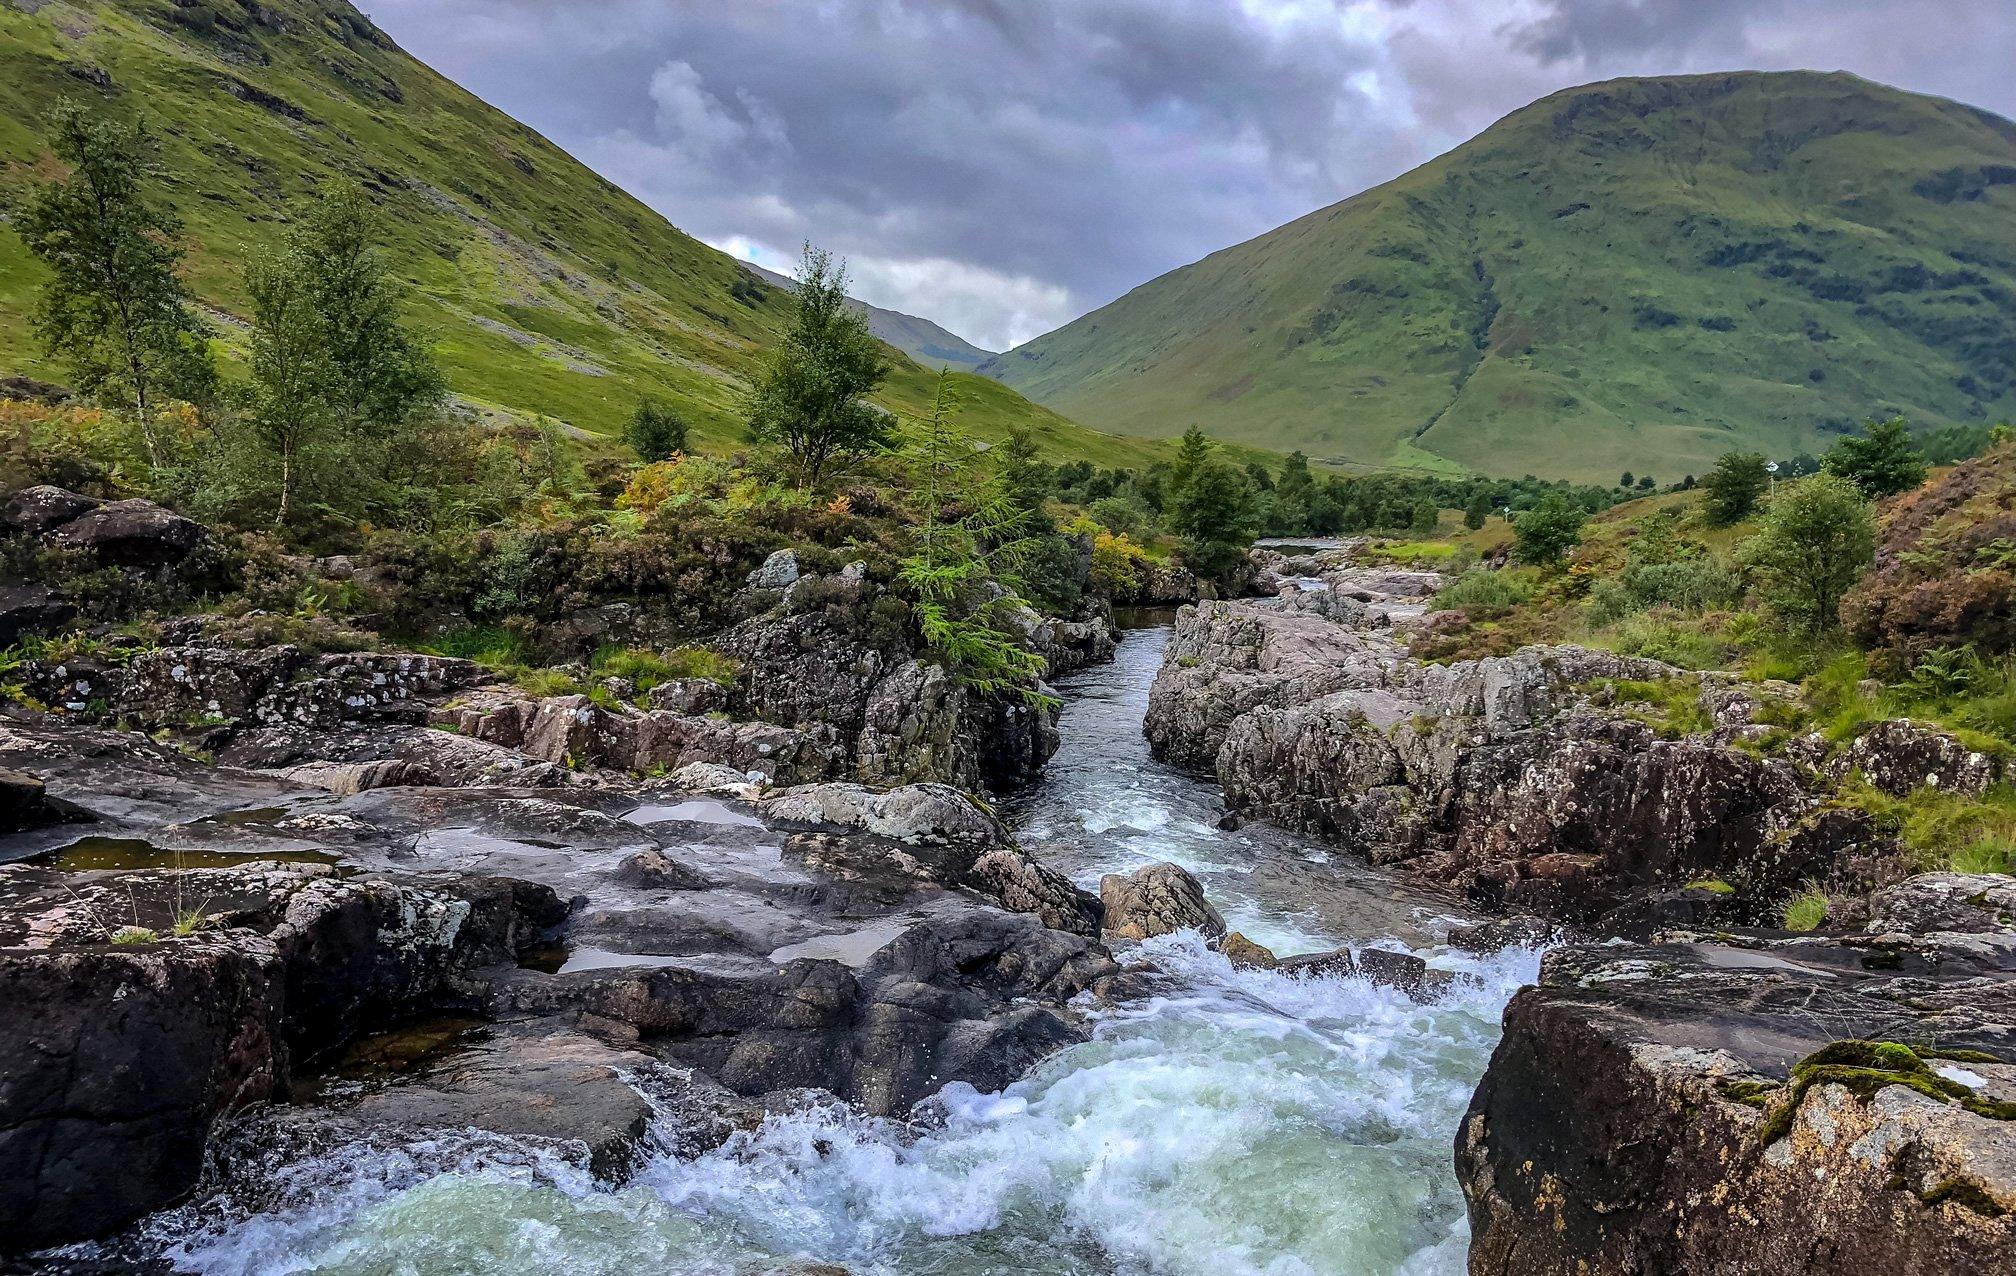 River running through Glencoe